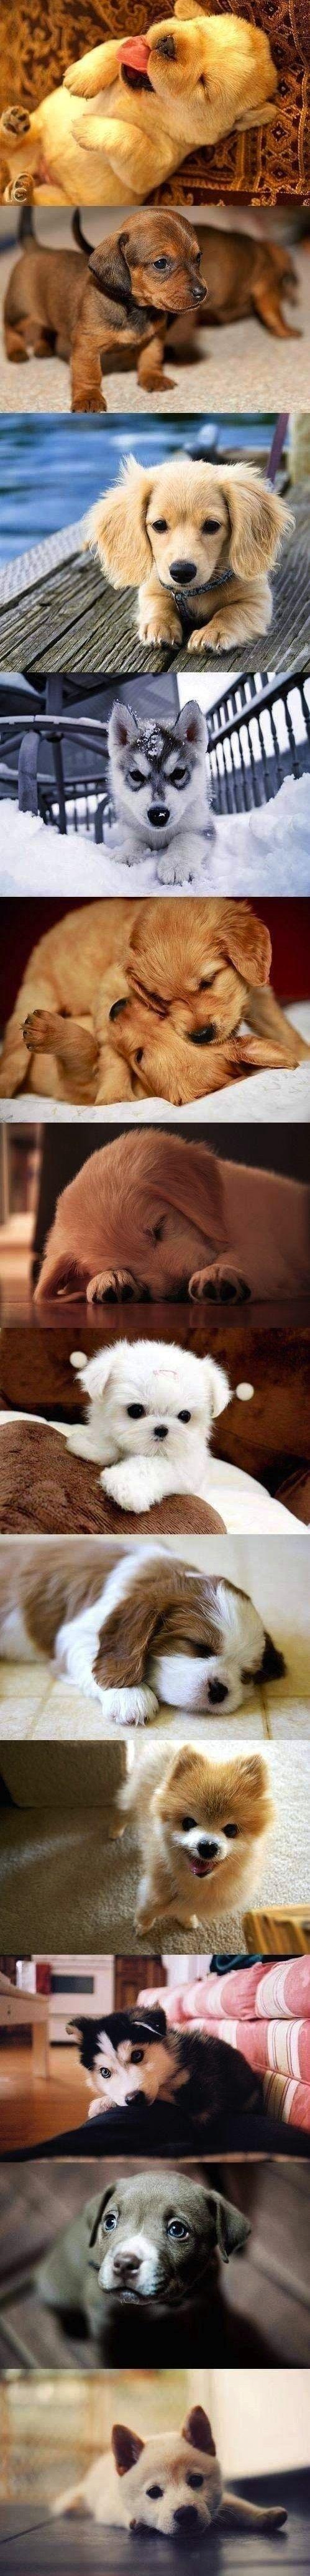 ❤❤❤So cute